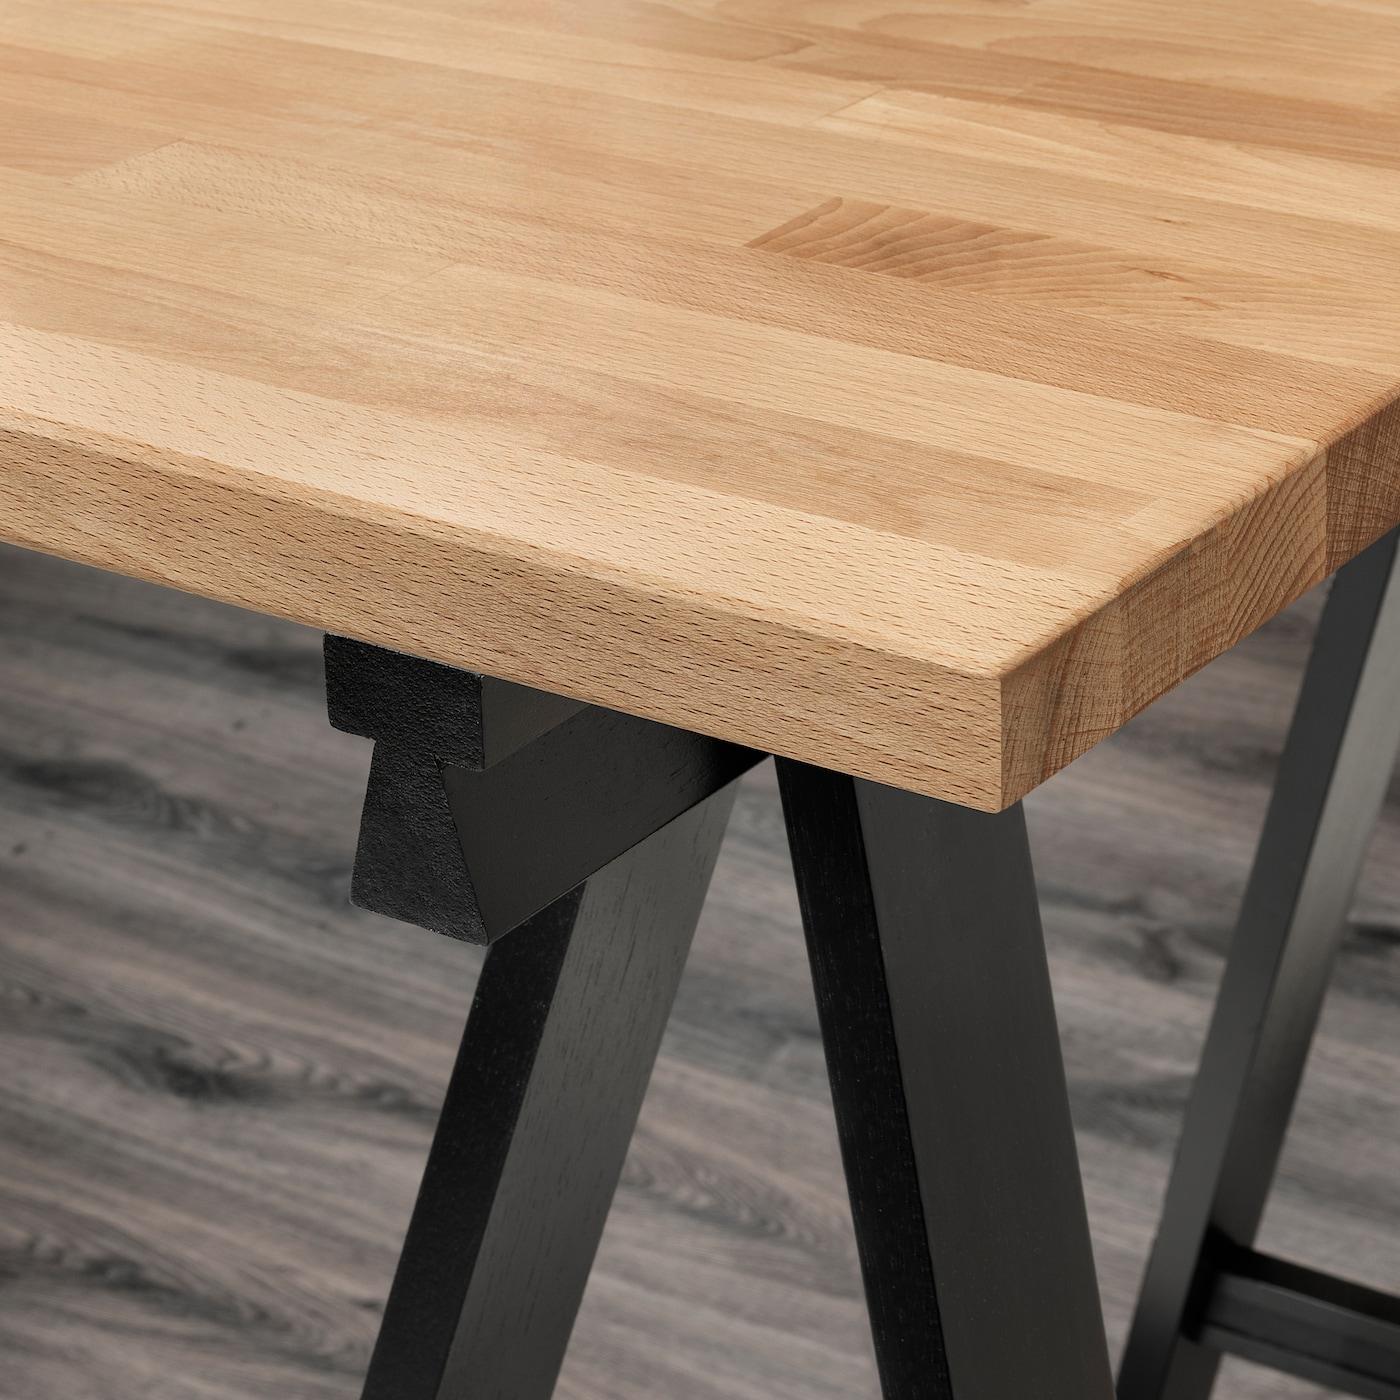 "GERTON Table - beech/black white 5x5 5/5 """